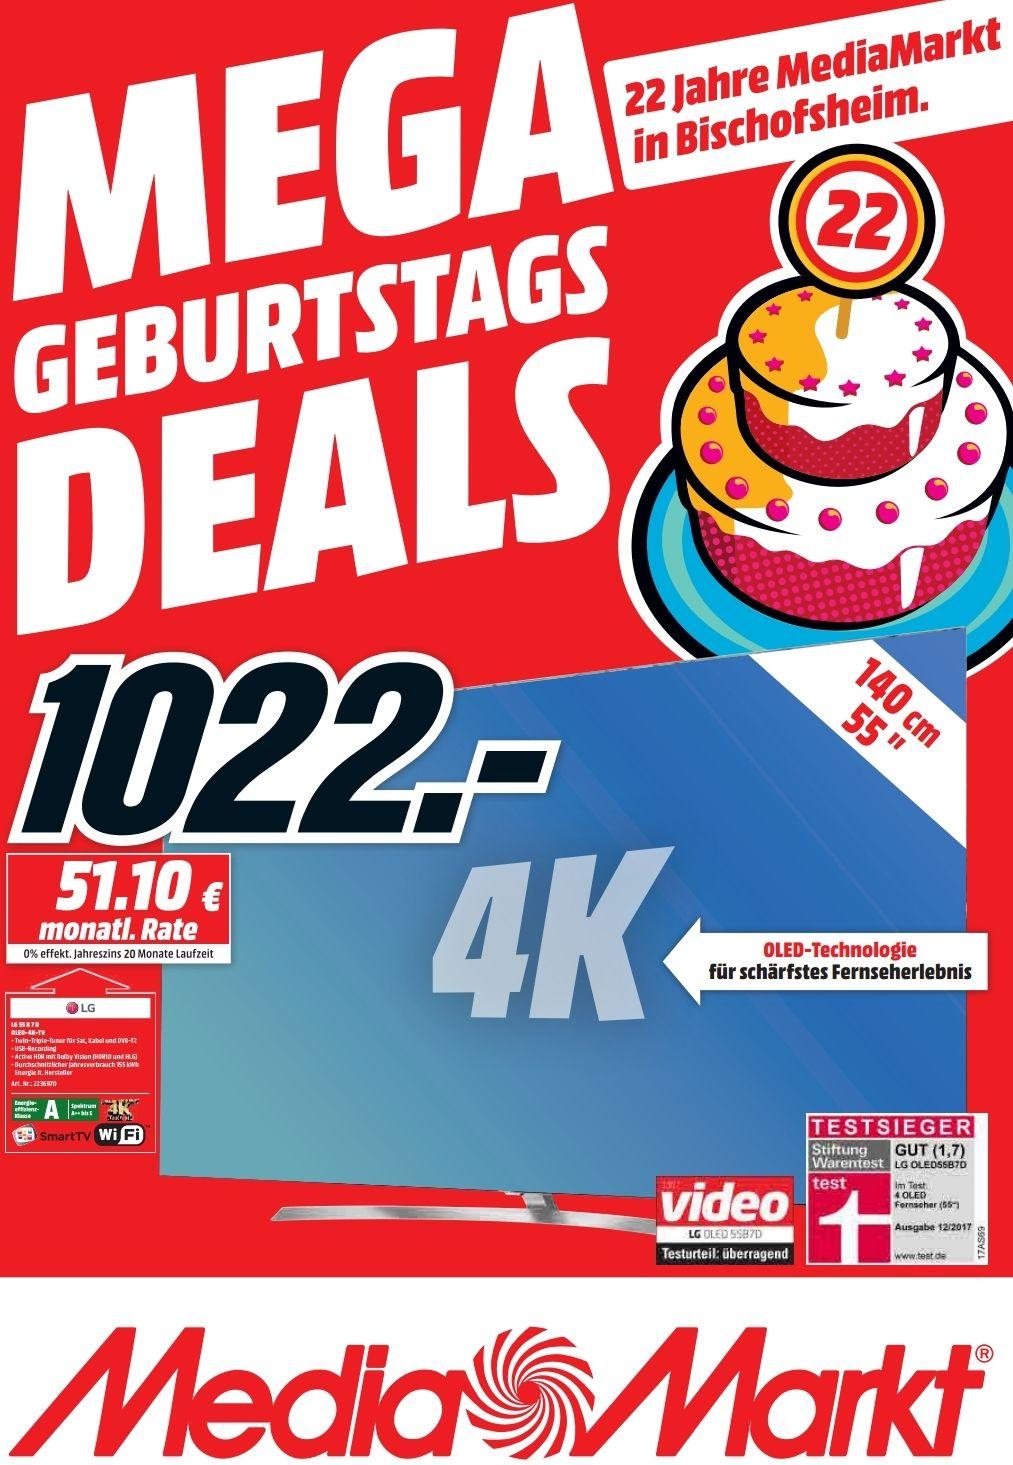 LG 55 Zoll Oled TV  55B7D lokal für für 1022€